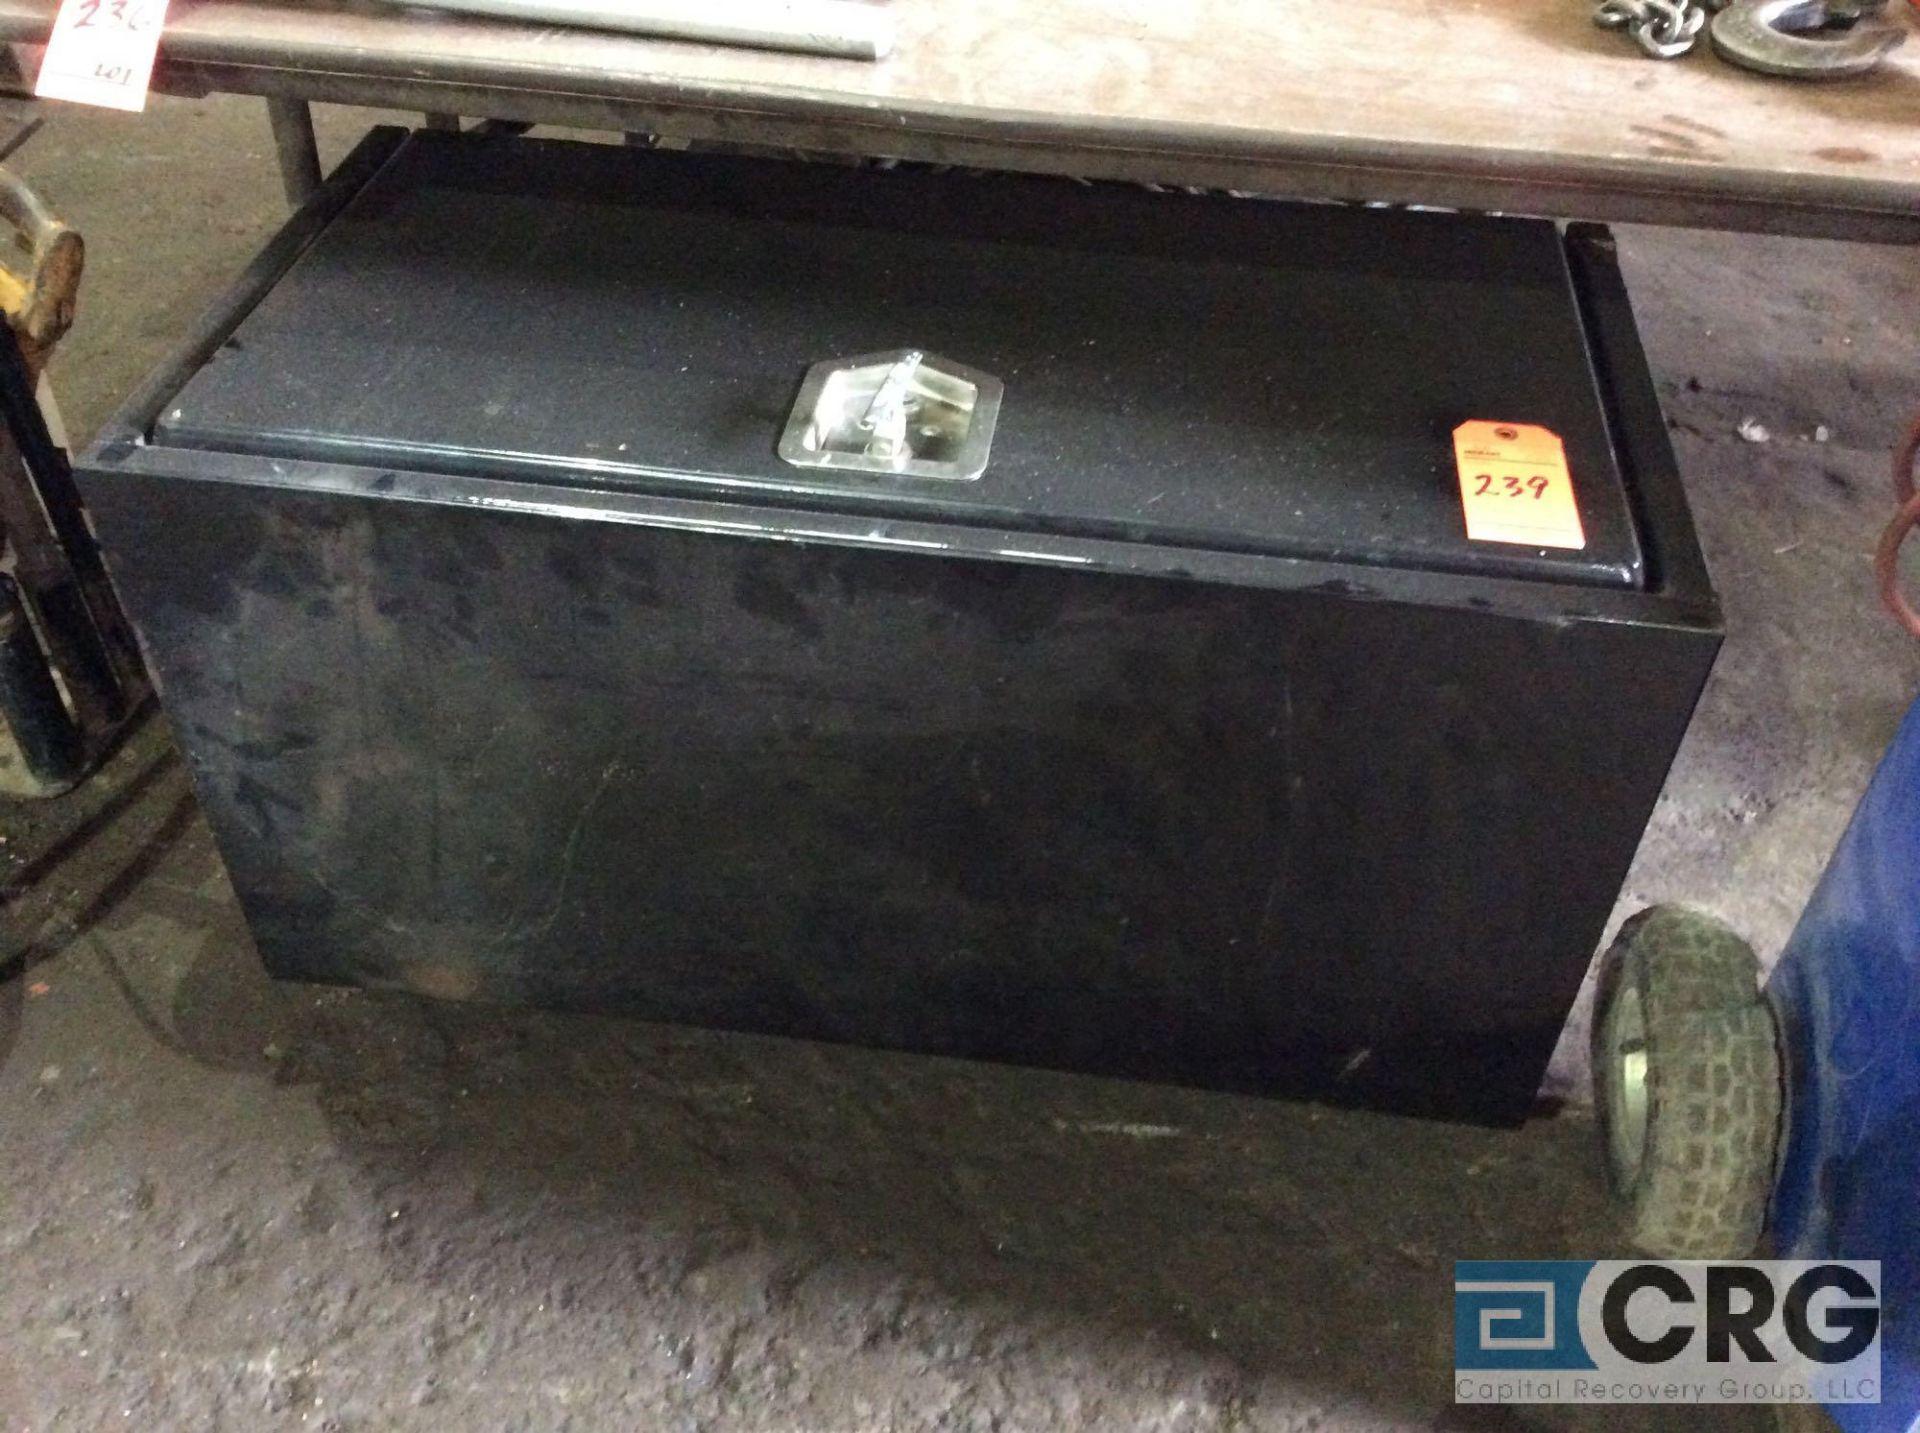 Lot 239 - 24 X 36 inch truck storage box